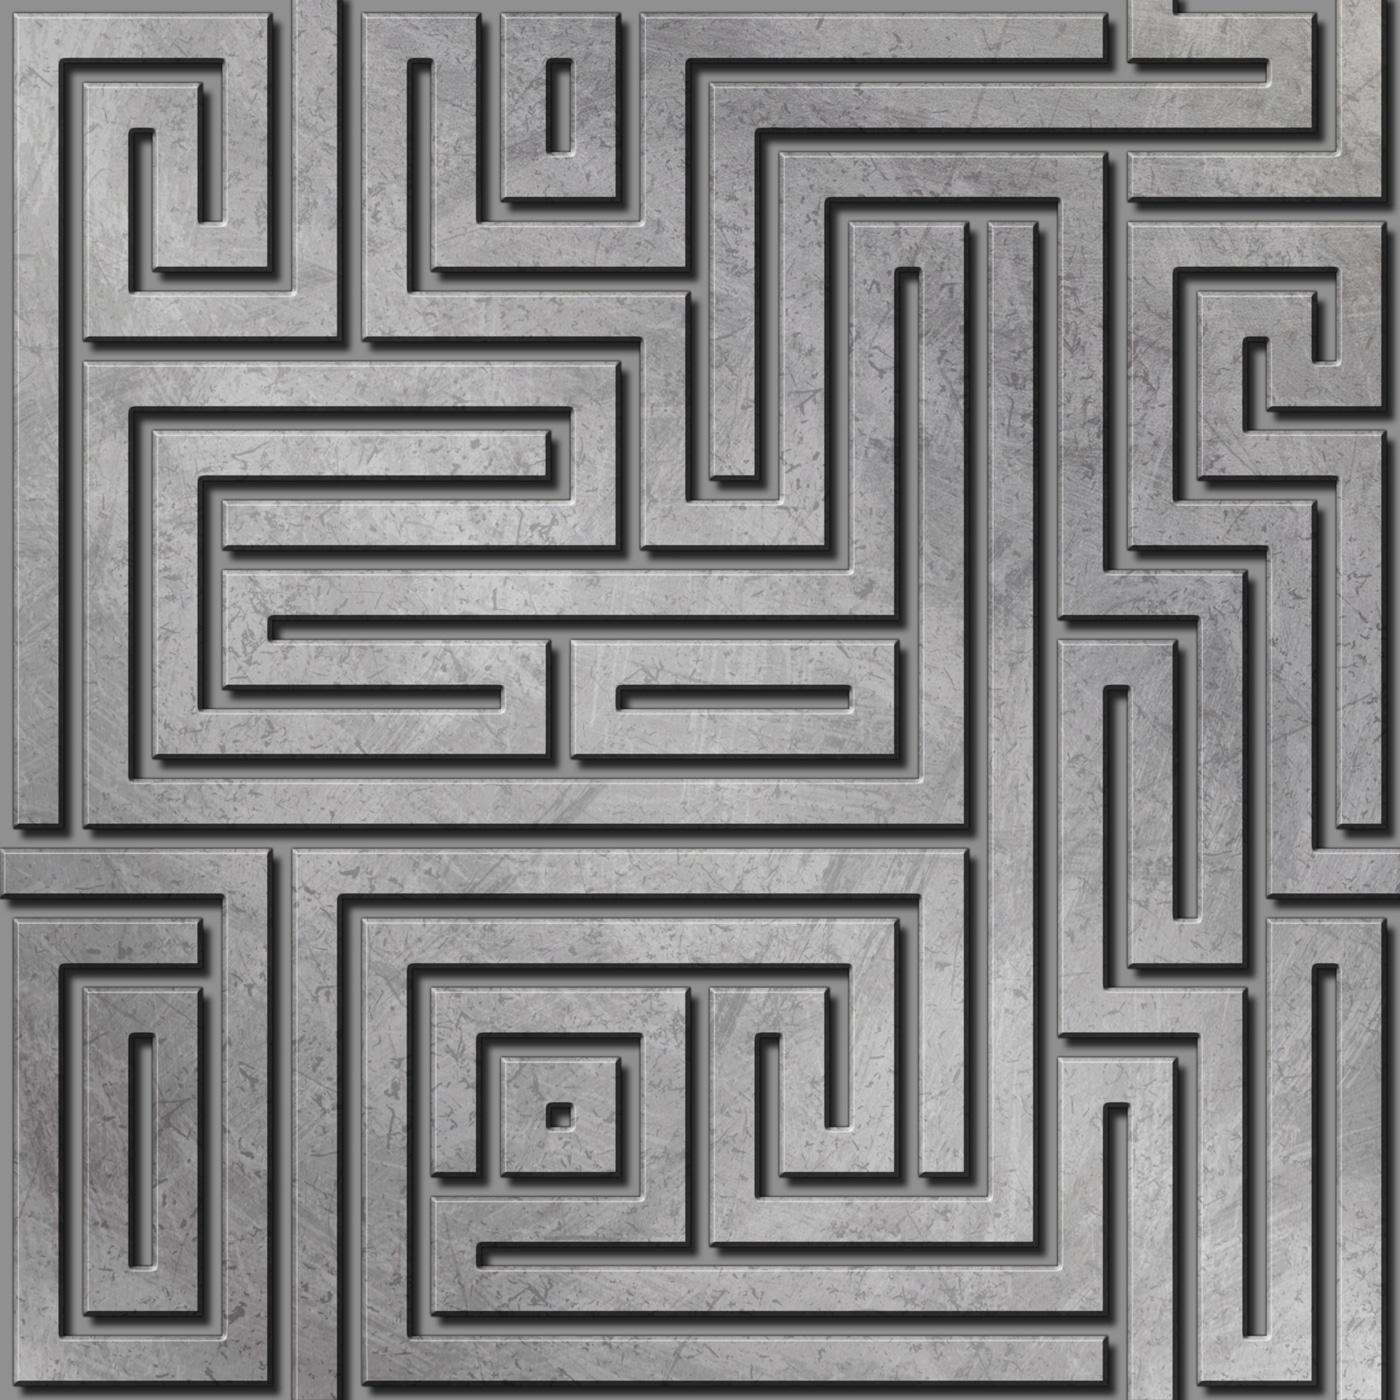 virtual-reality-system-maze